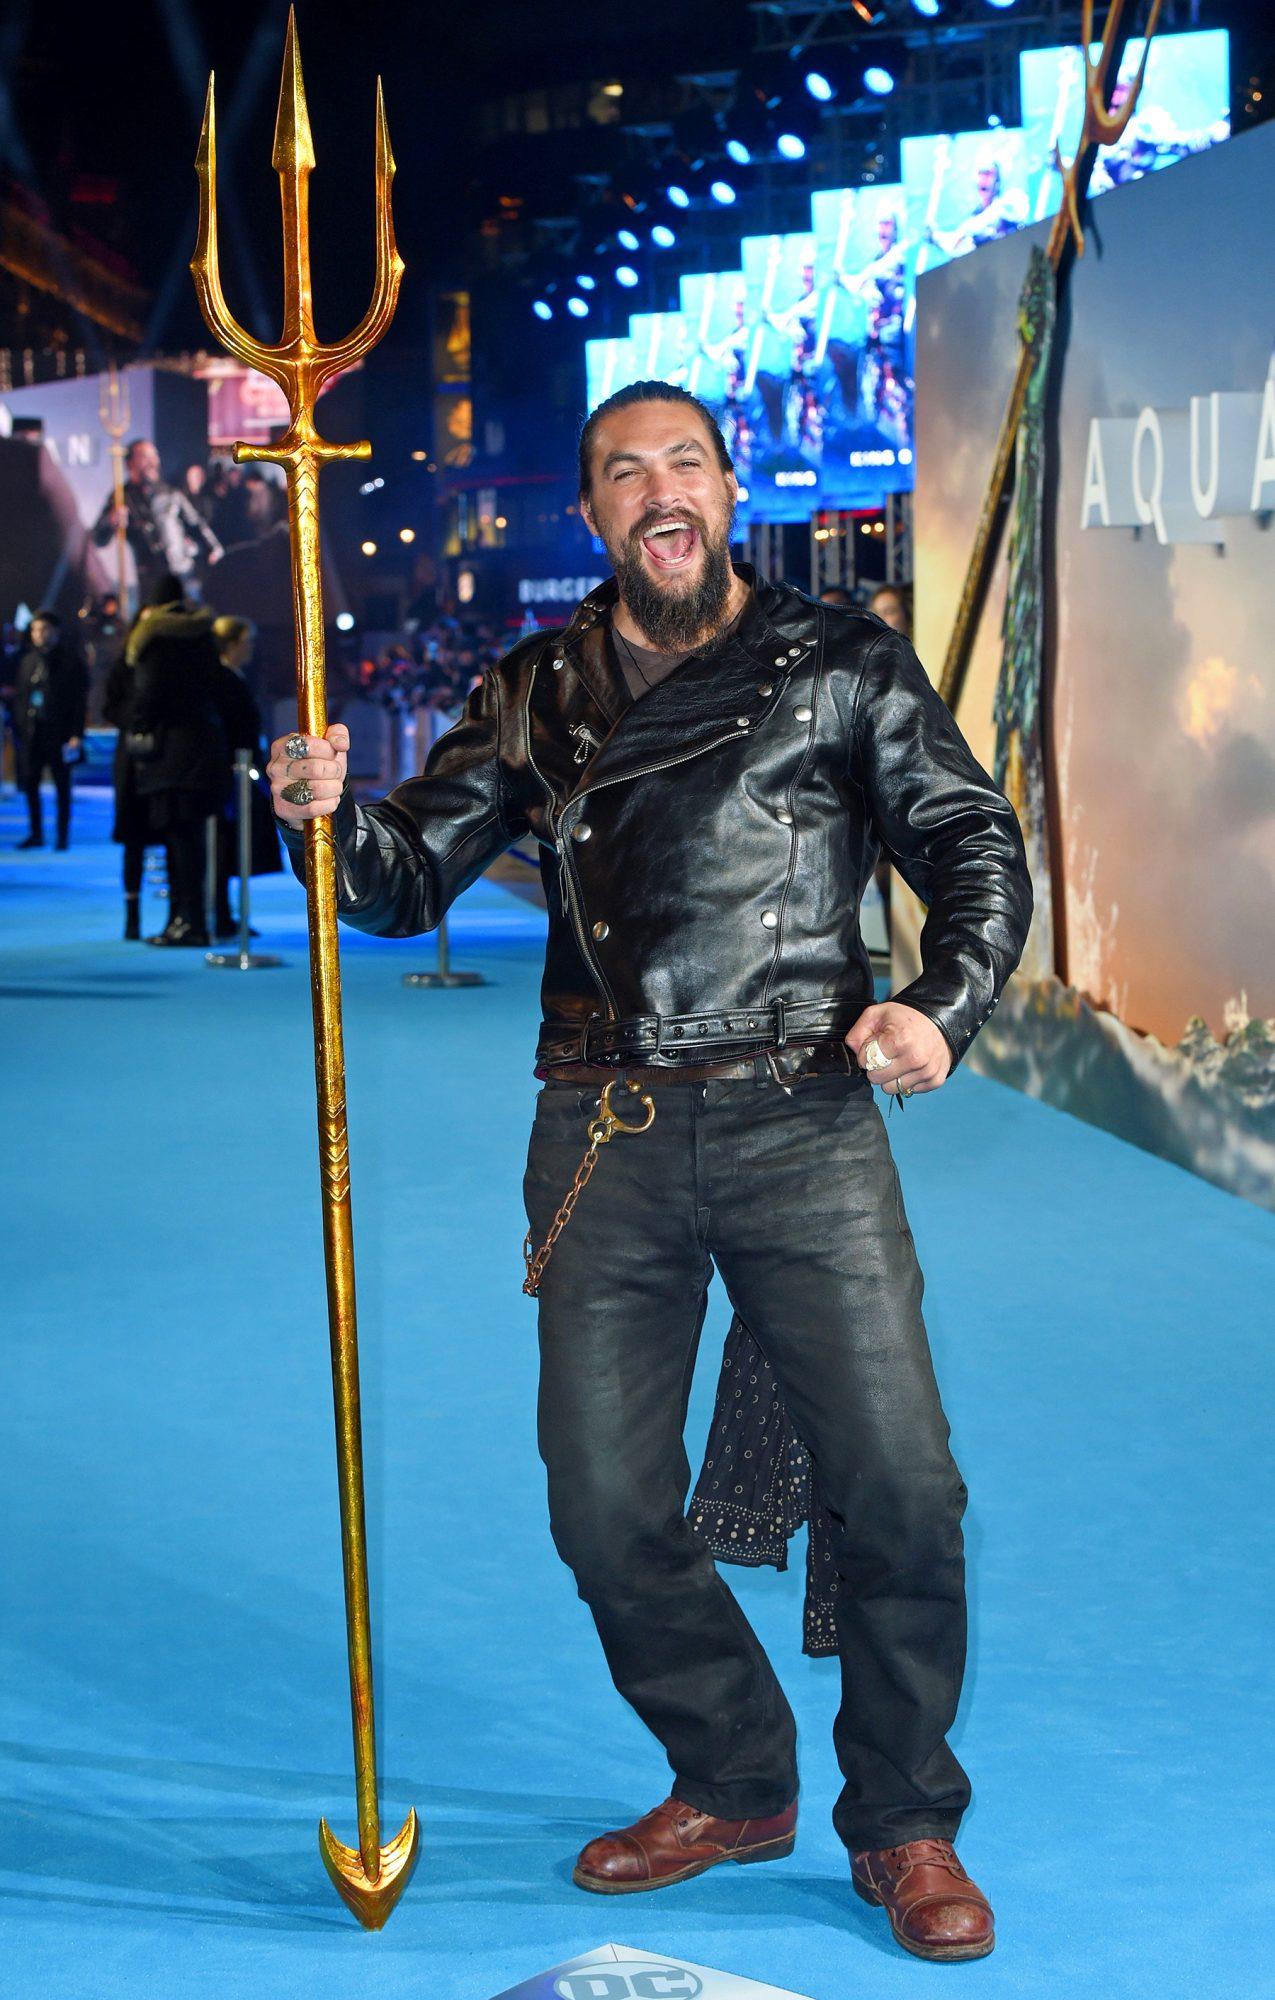 'Aquaman' film premiere, London, UK - 26 Nov 2018